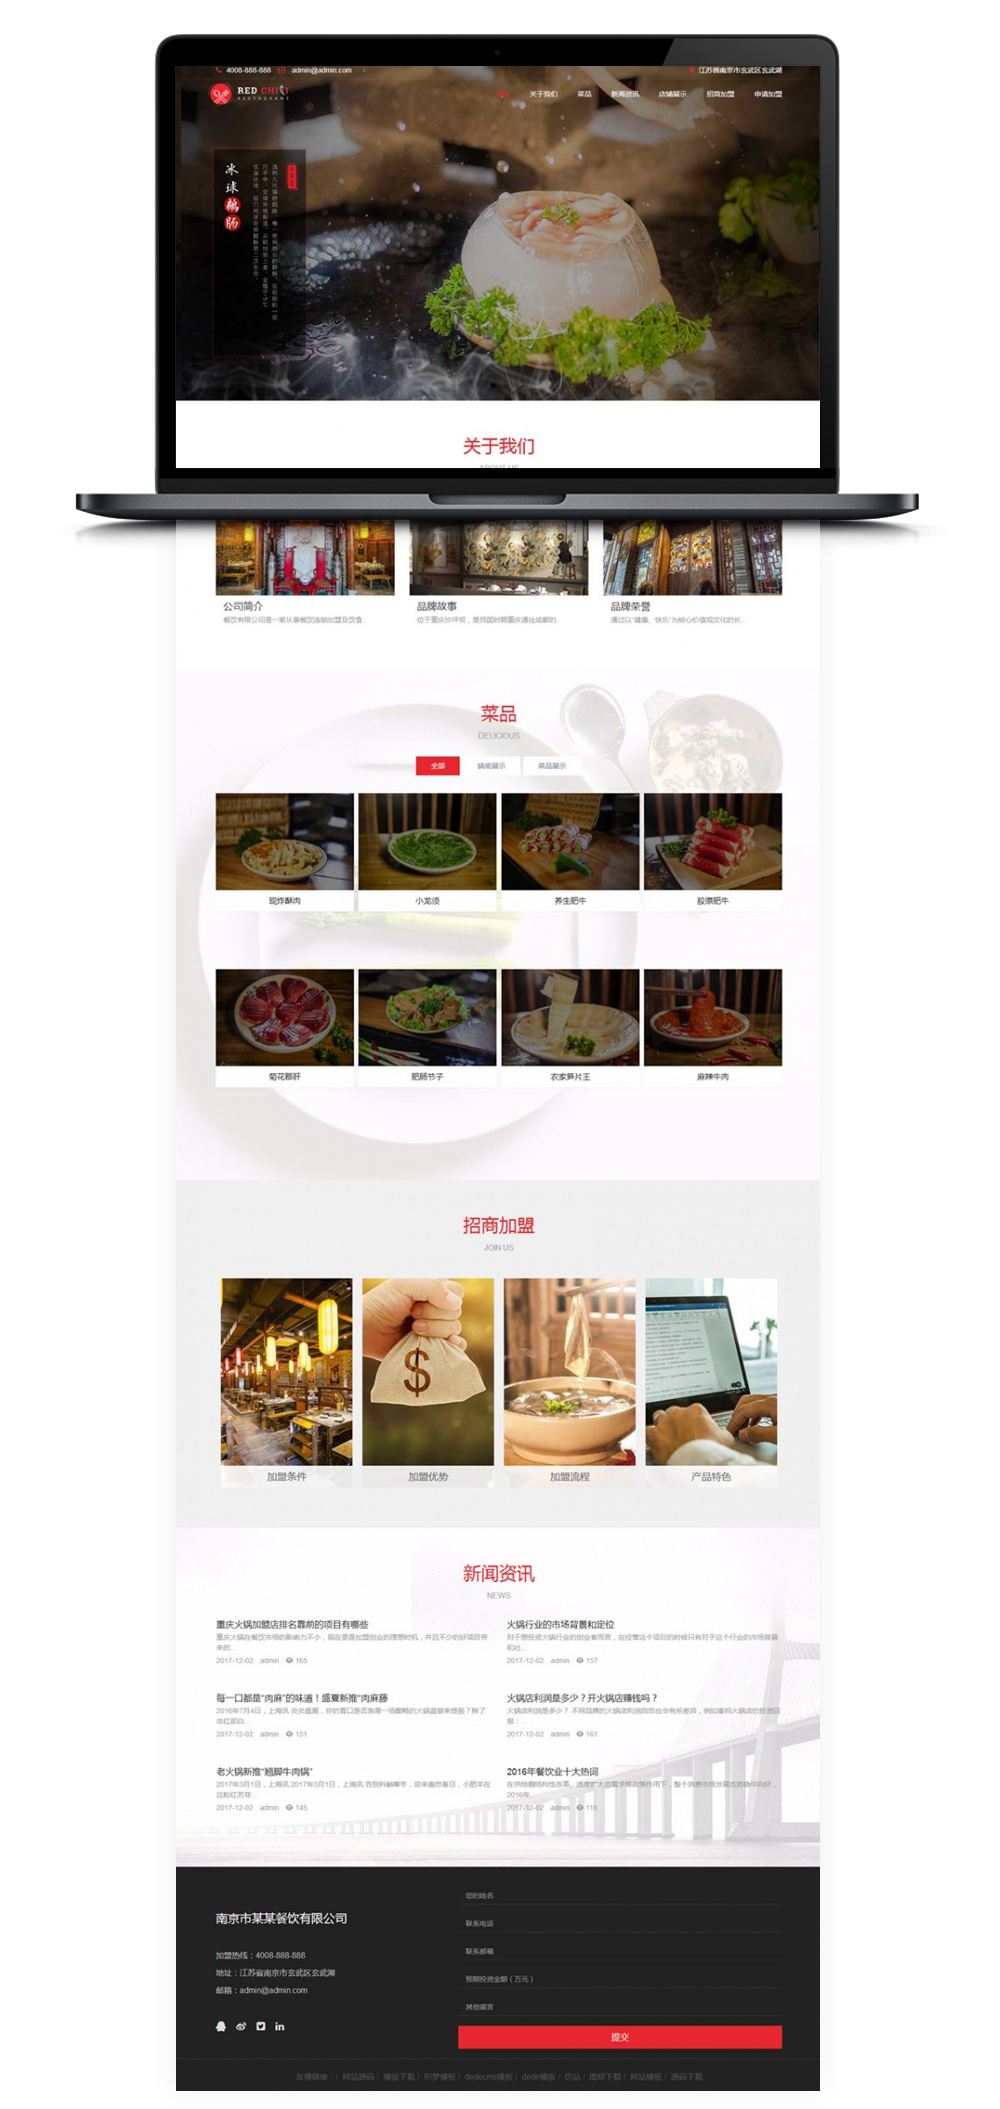 【DEDECMS模板】美食餐饮加盟管理企业网站HTML5模板[自适应手机WAP端]-找主题源码